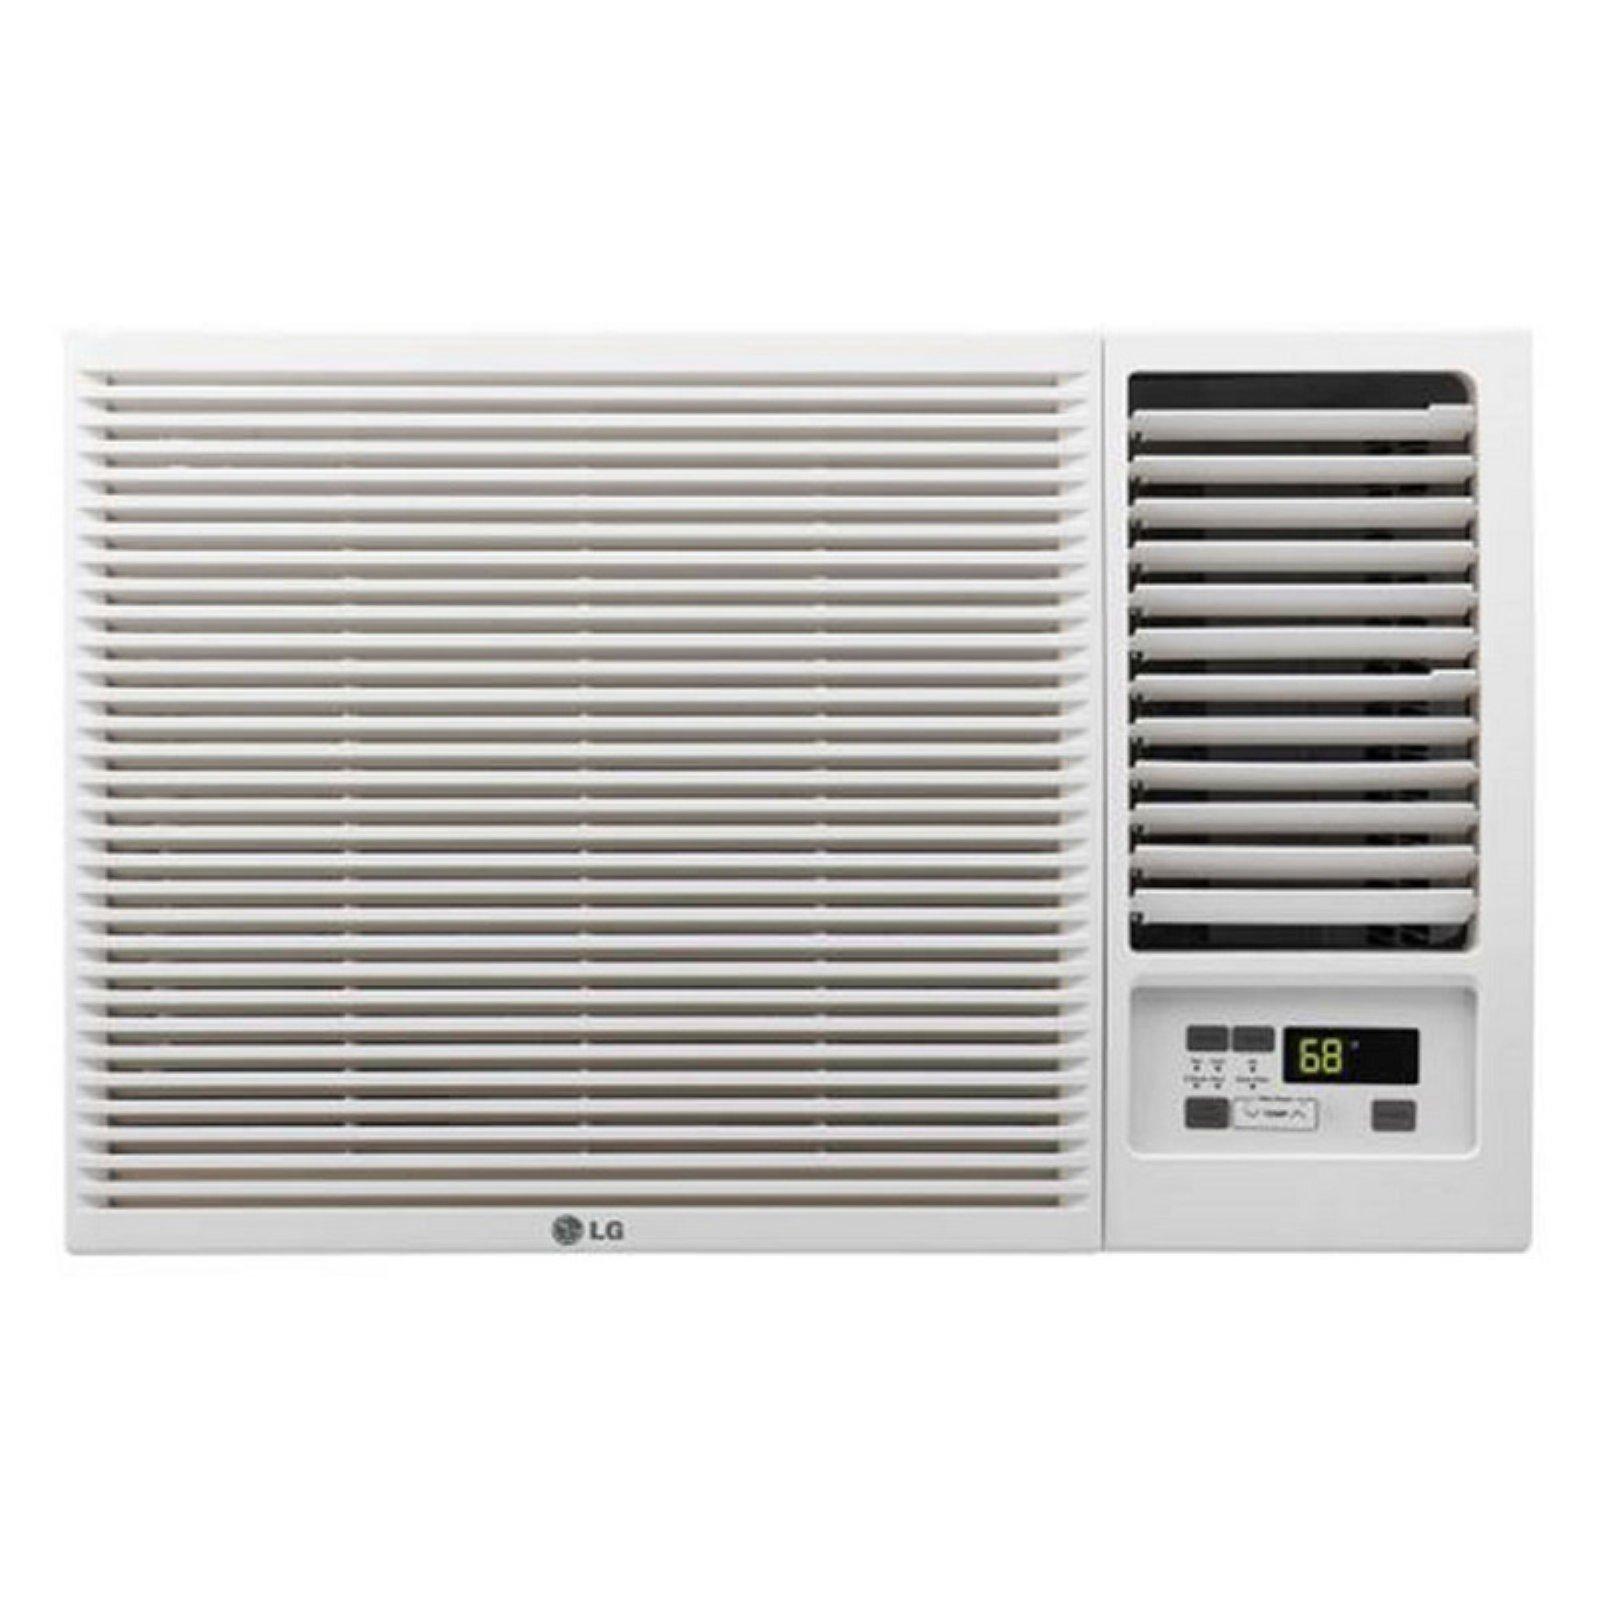 LG LW8016HR 7,500 BTU 115V Window-Mounted Air Conditioner with 3,850 BTU Supplemental Heat Function